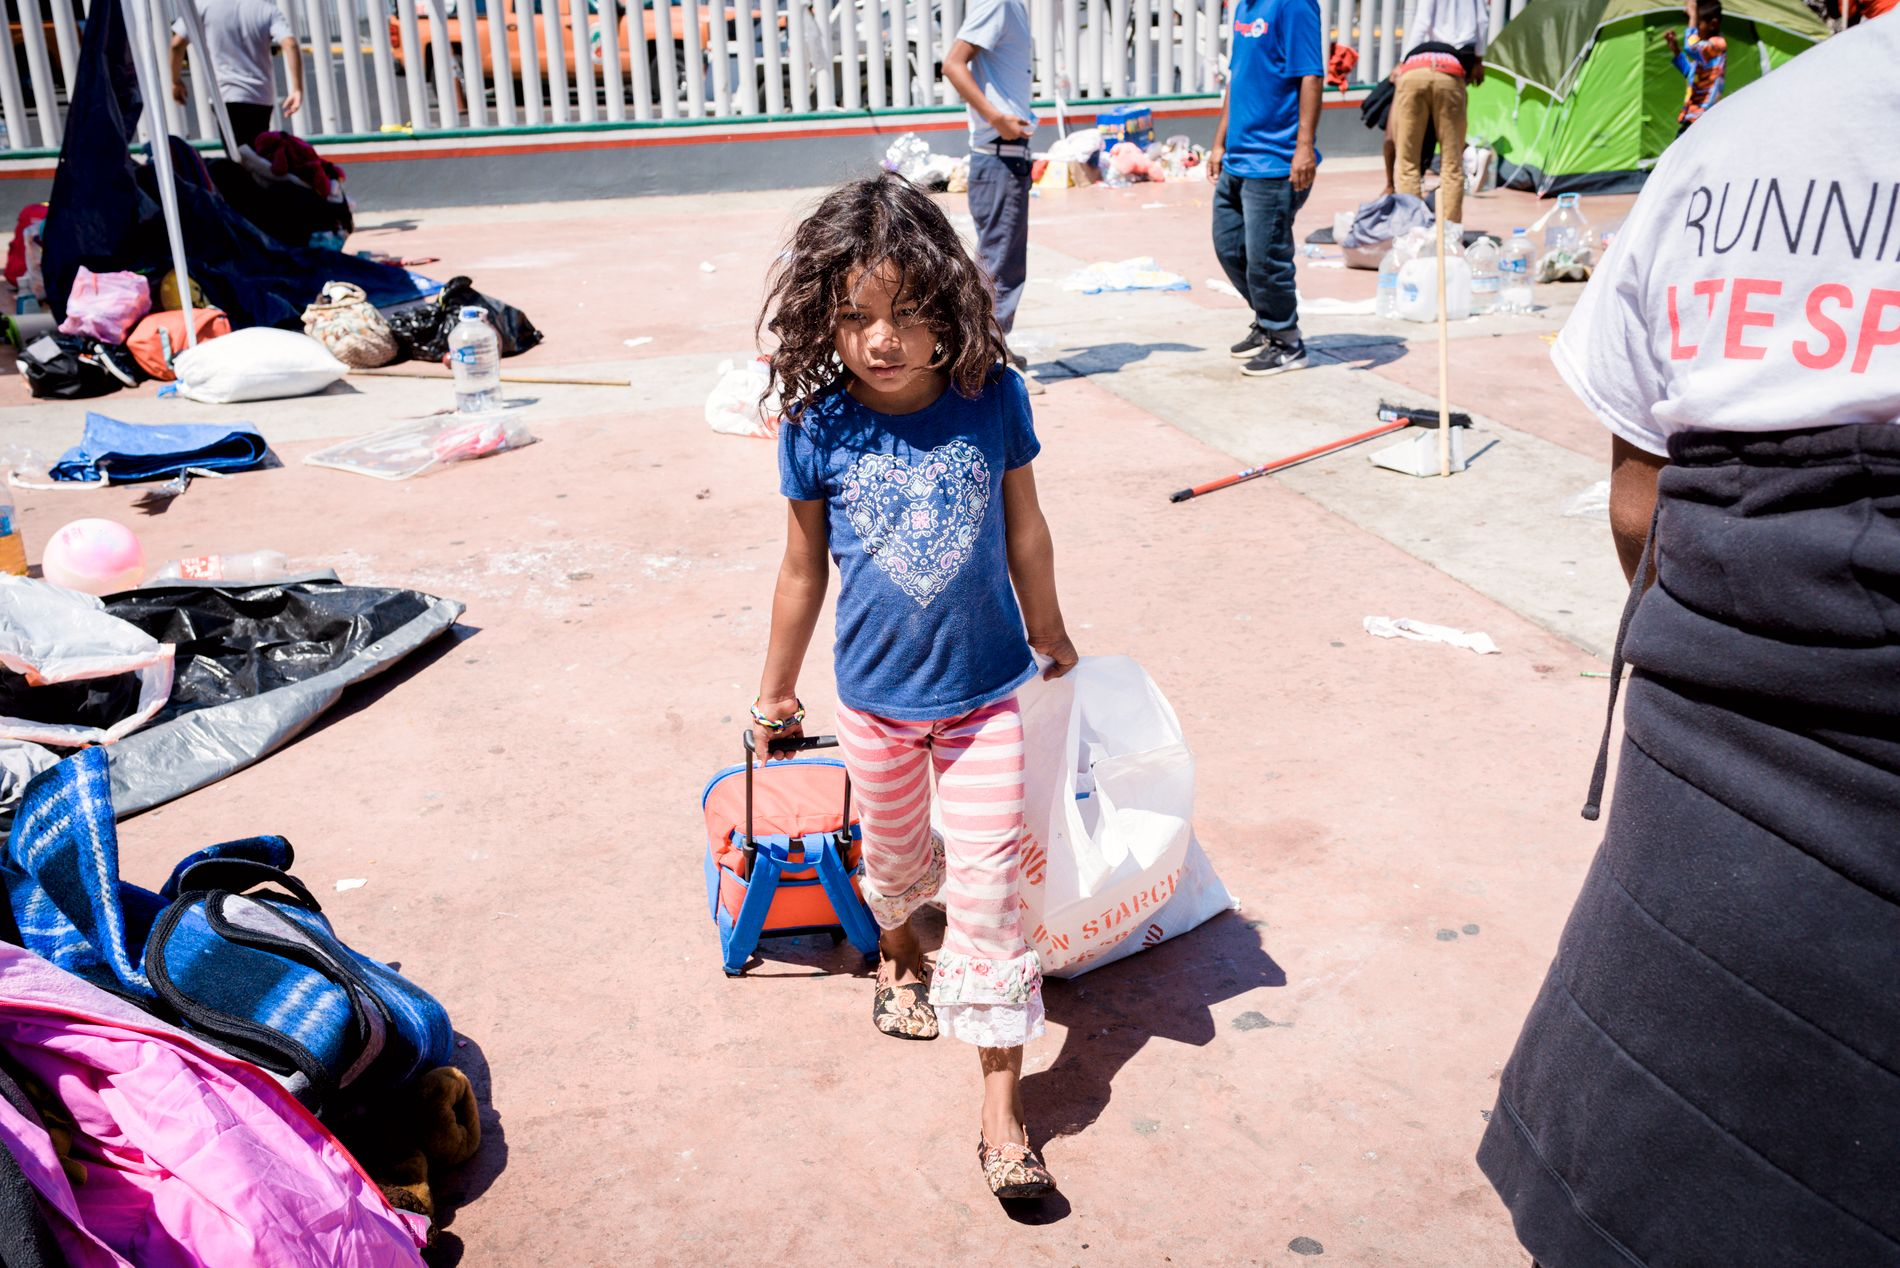 IMMIGRANT: En ung jente i flyktningleir ved Mexicos grense mot USA.